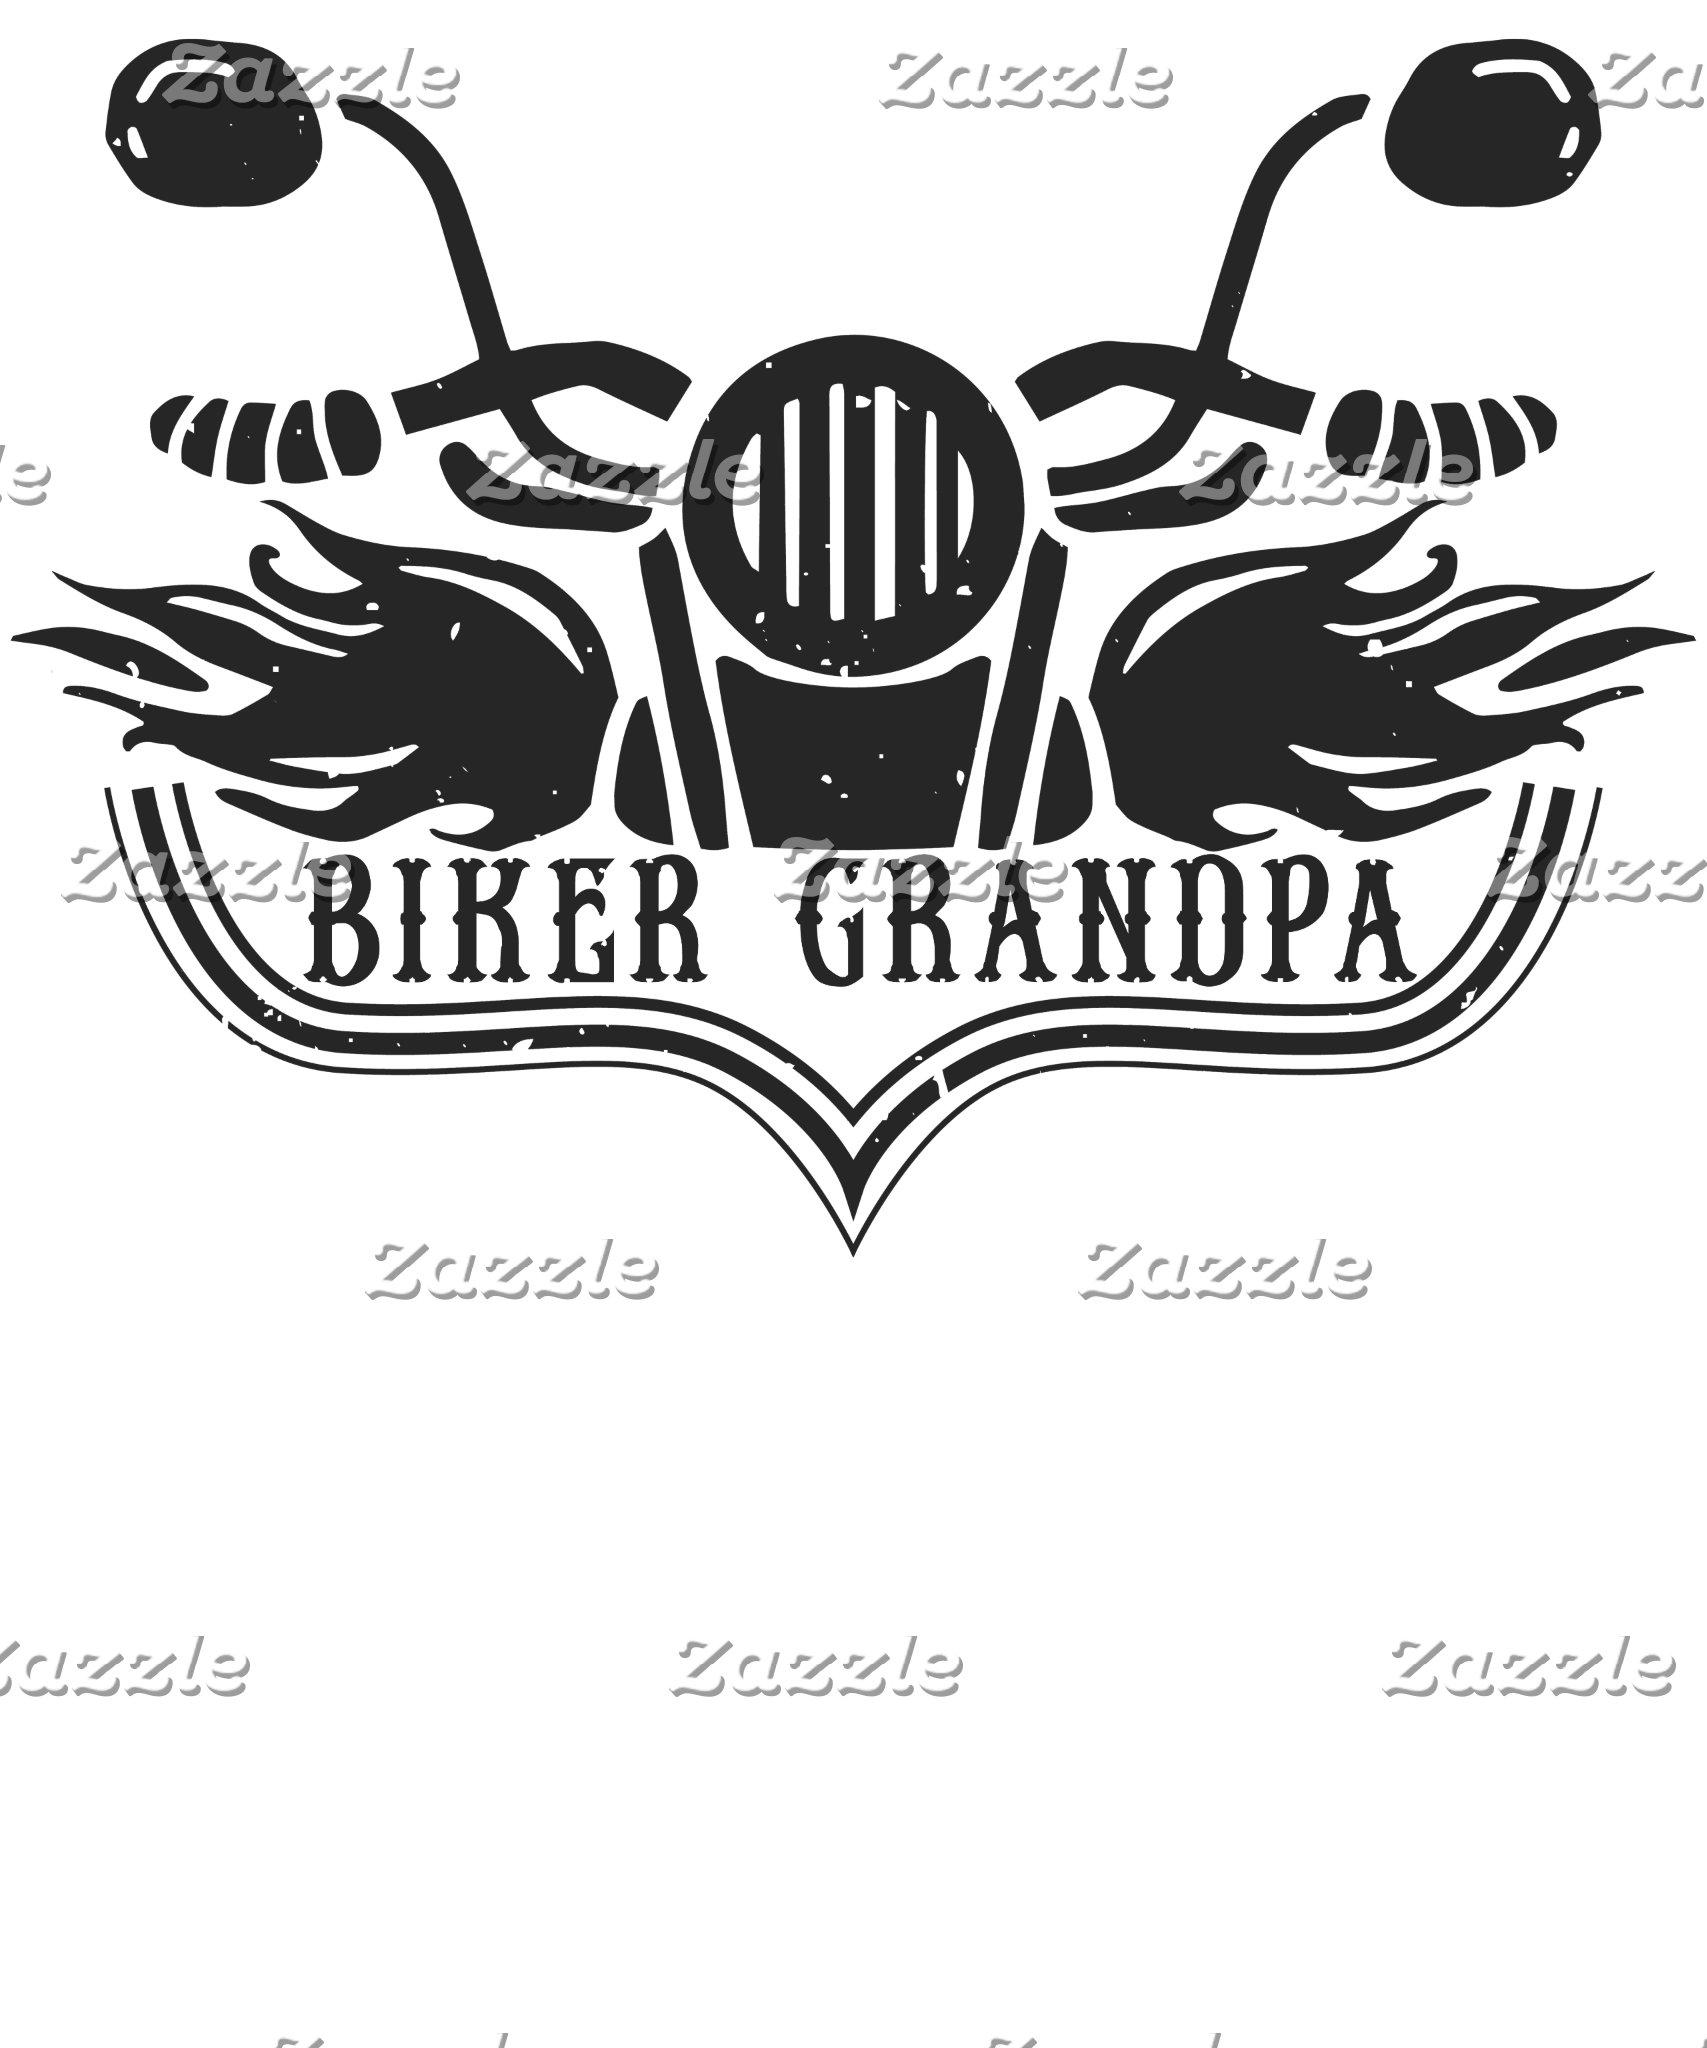 Biker Grandpa